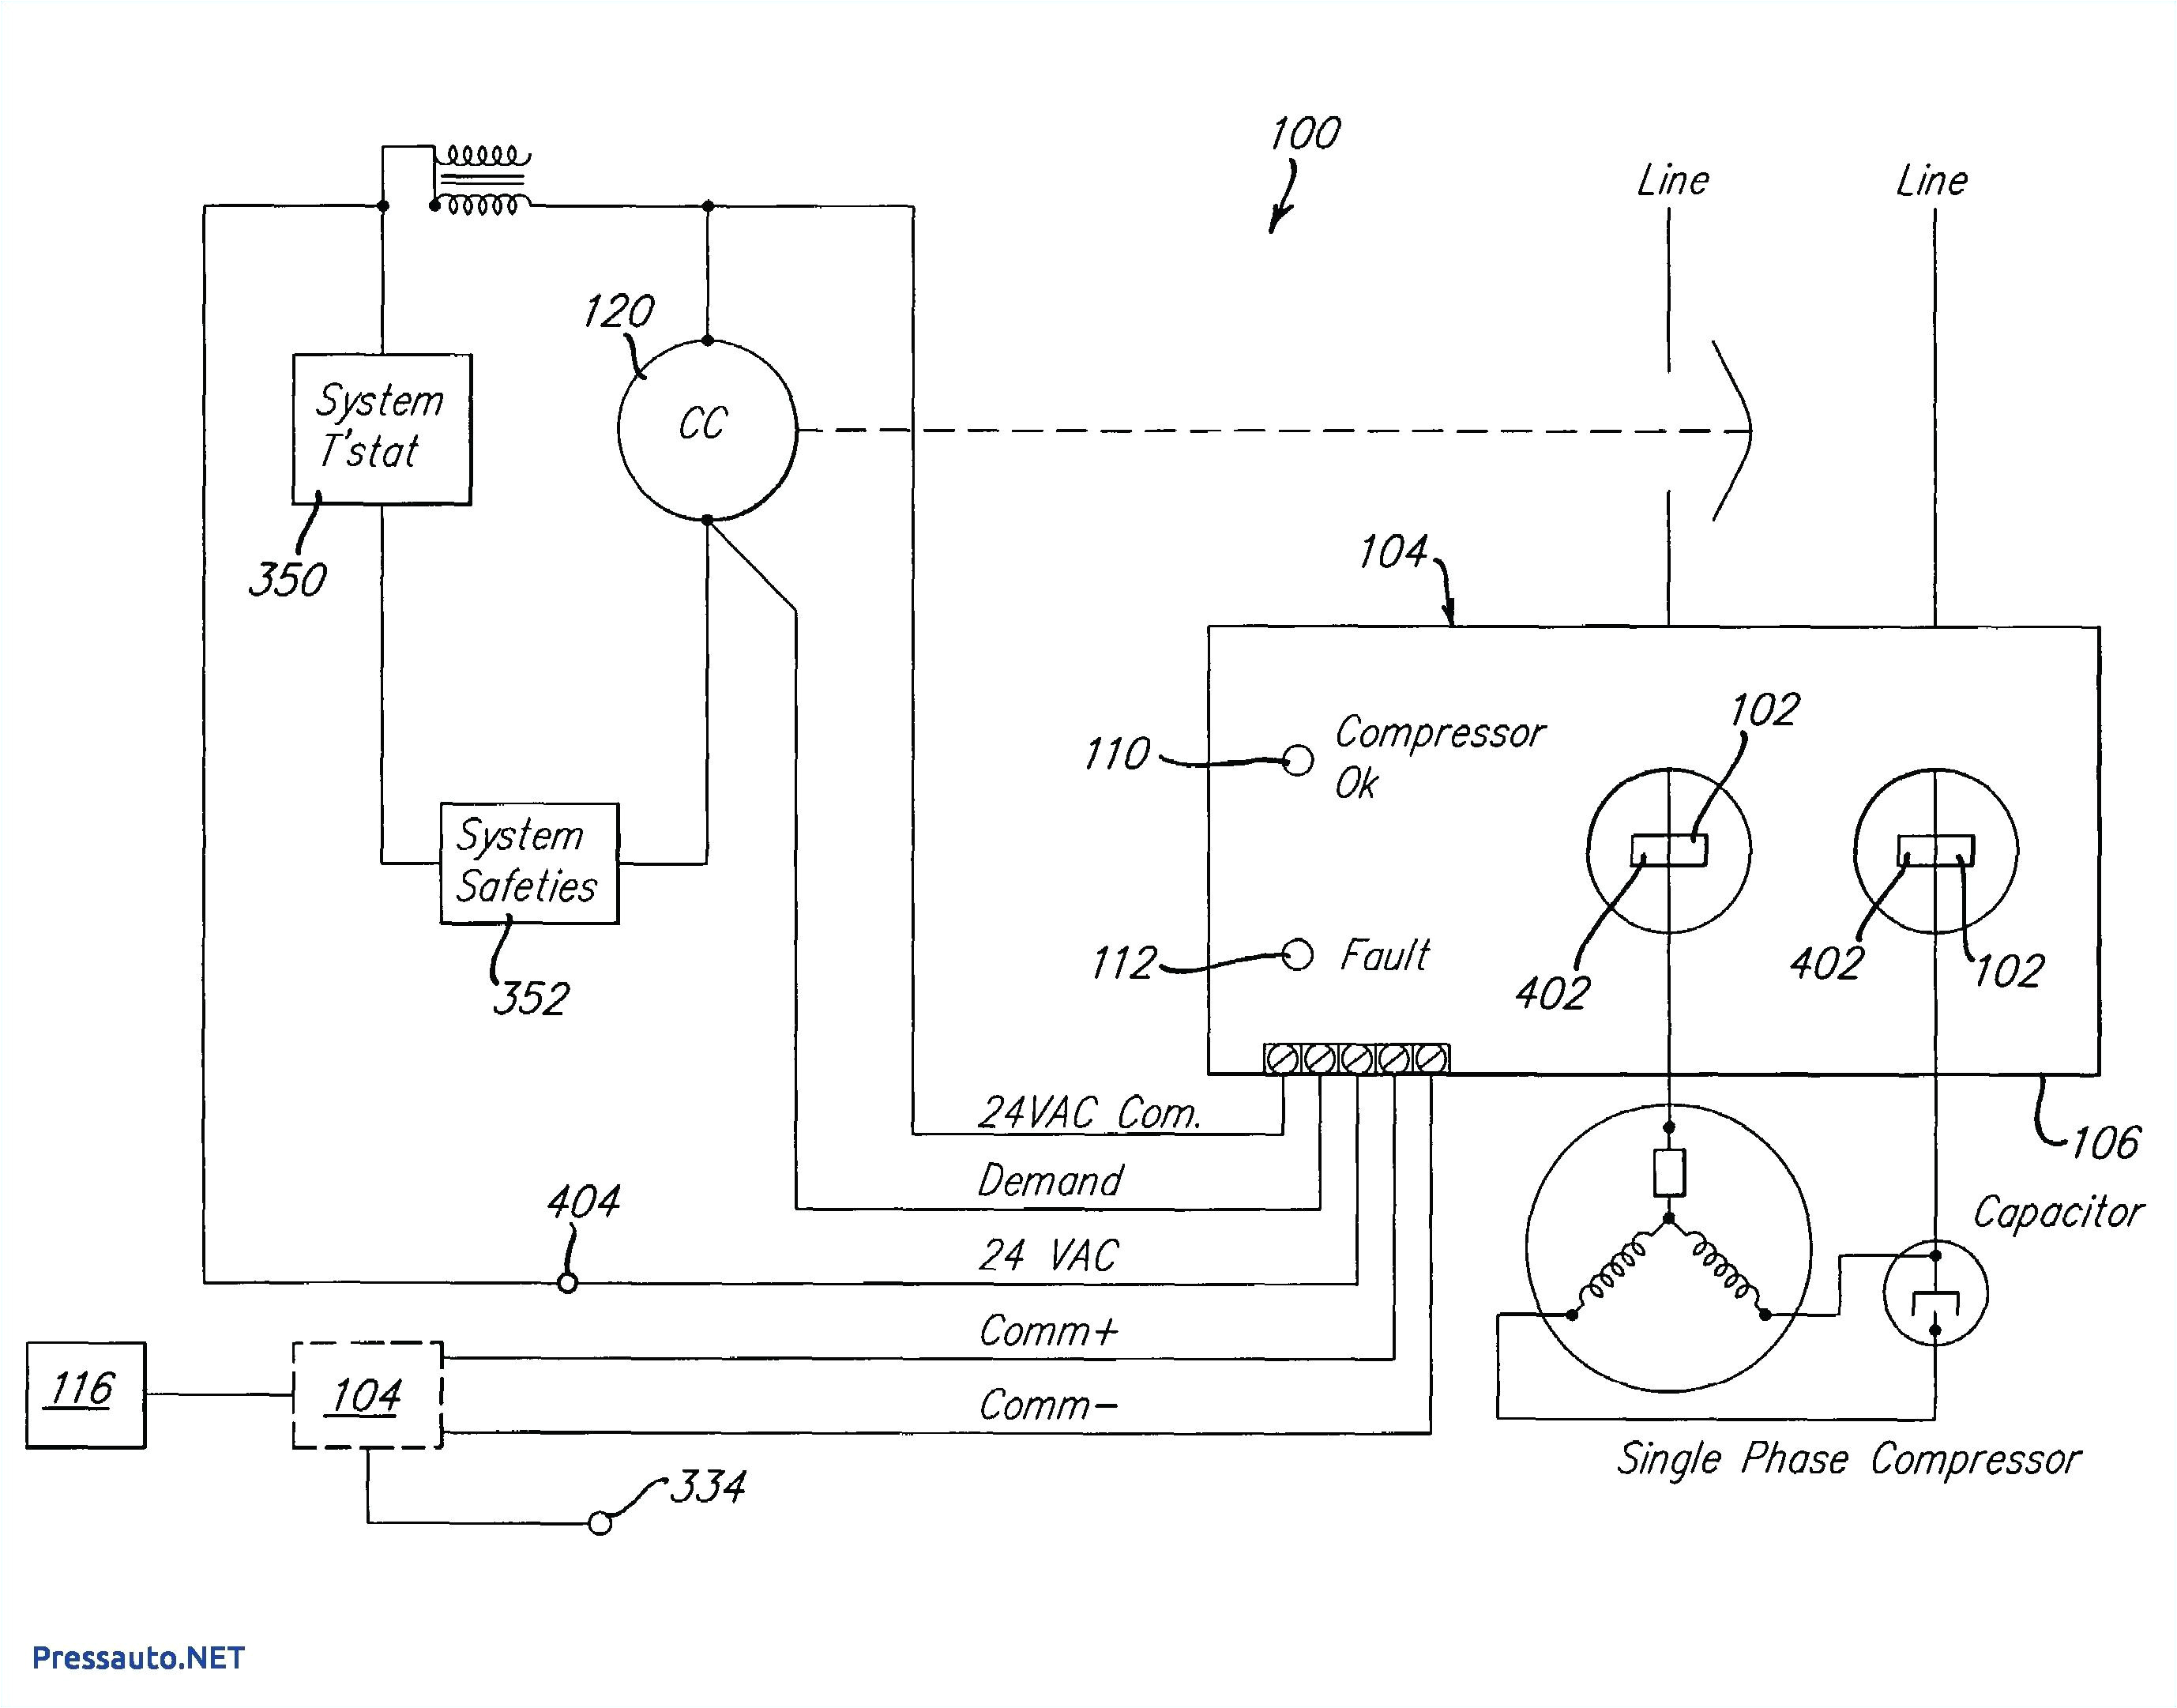 whirlpool refrigerator schematic diagram gb22dkxjw01 wiring diagramwhirlpool refrigerator schematic diagram gb22dkxjw01 wiringwhirlpool refrigerator wiring